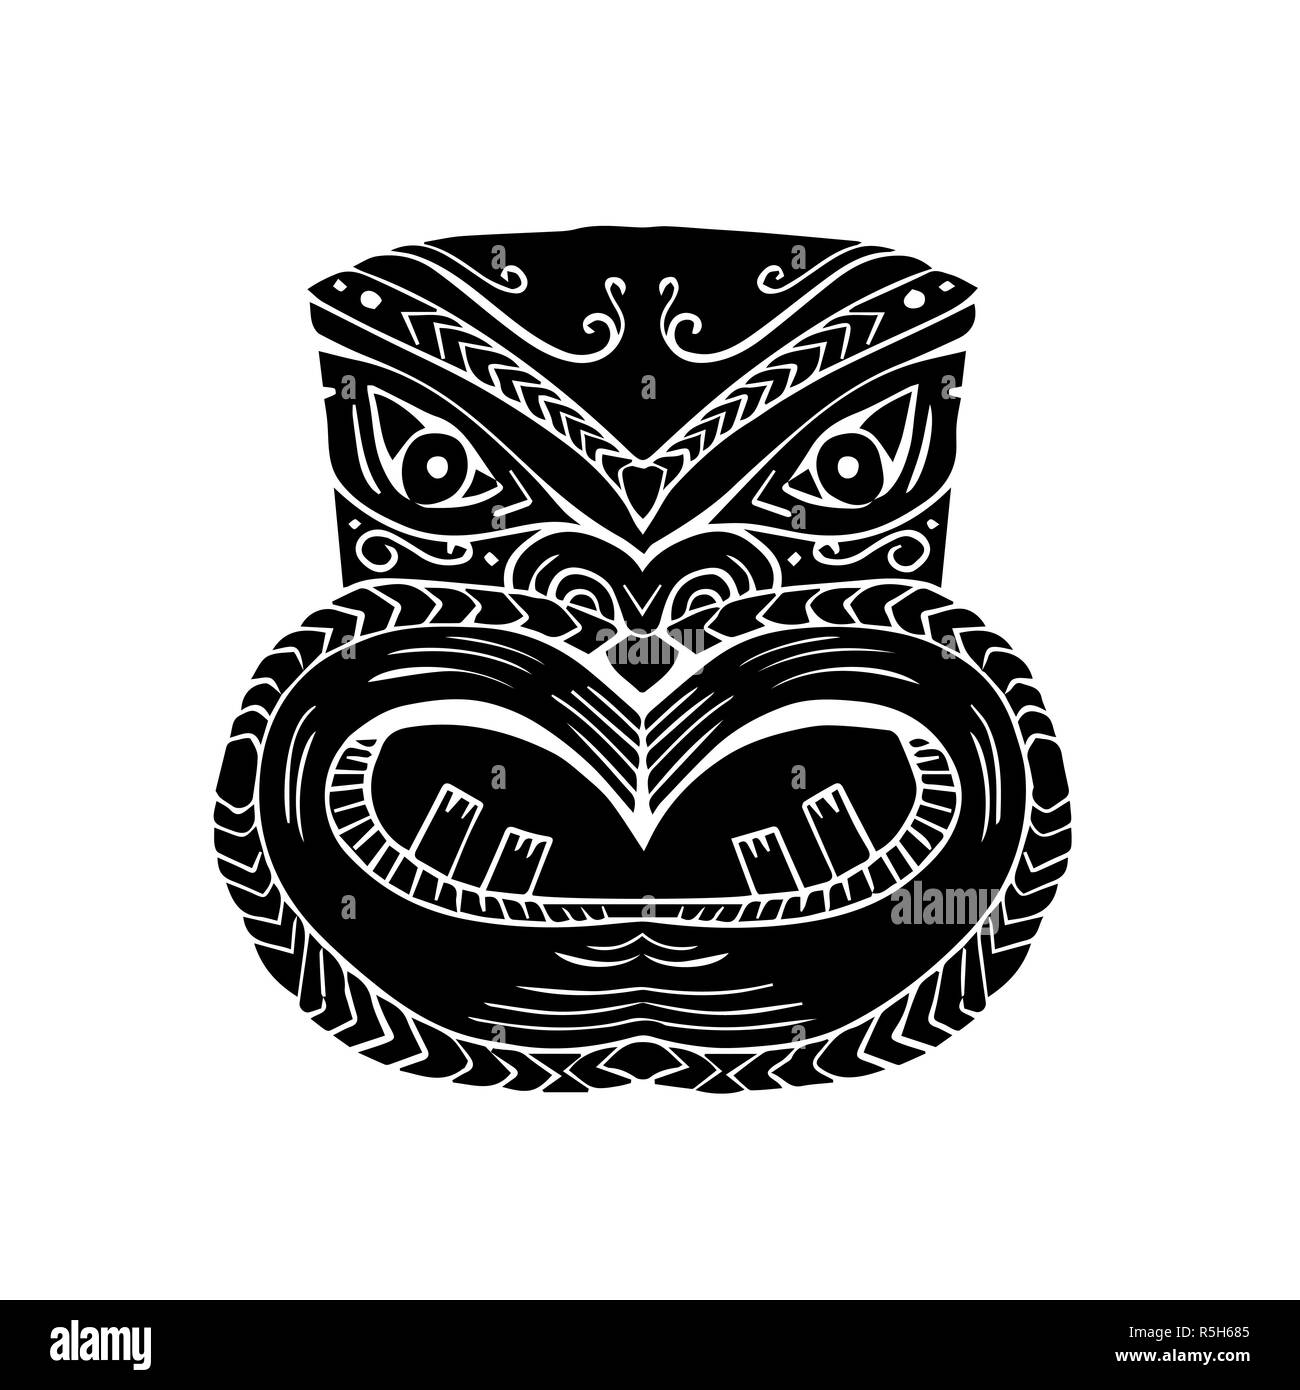 New Zealand Maori Koruru Tiki Mask Woodcut - Stock Image